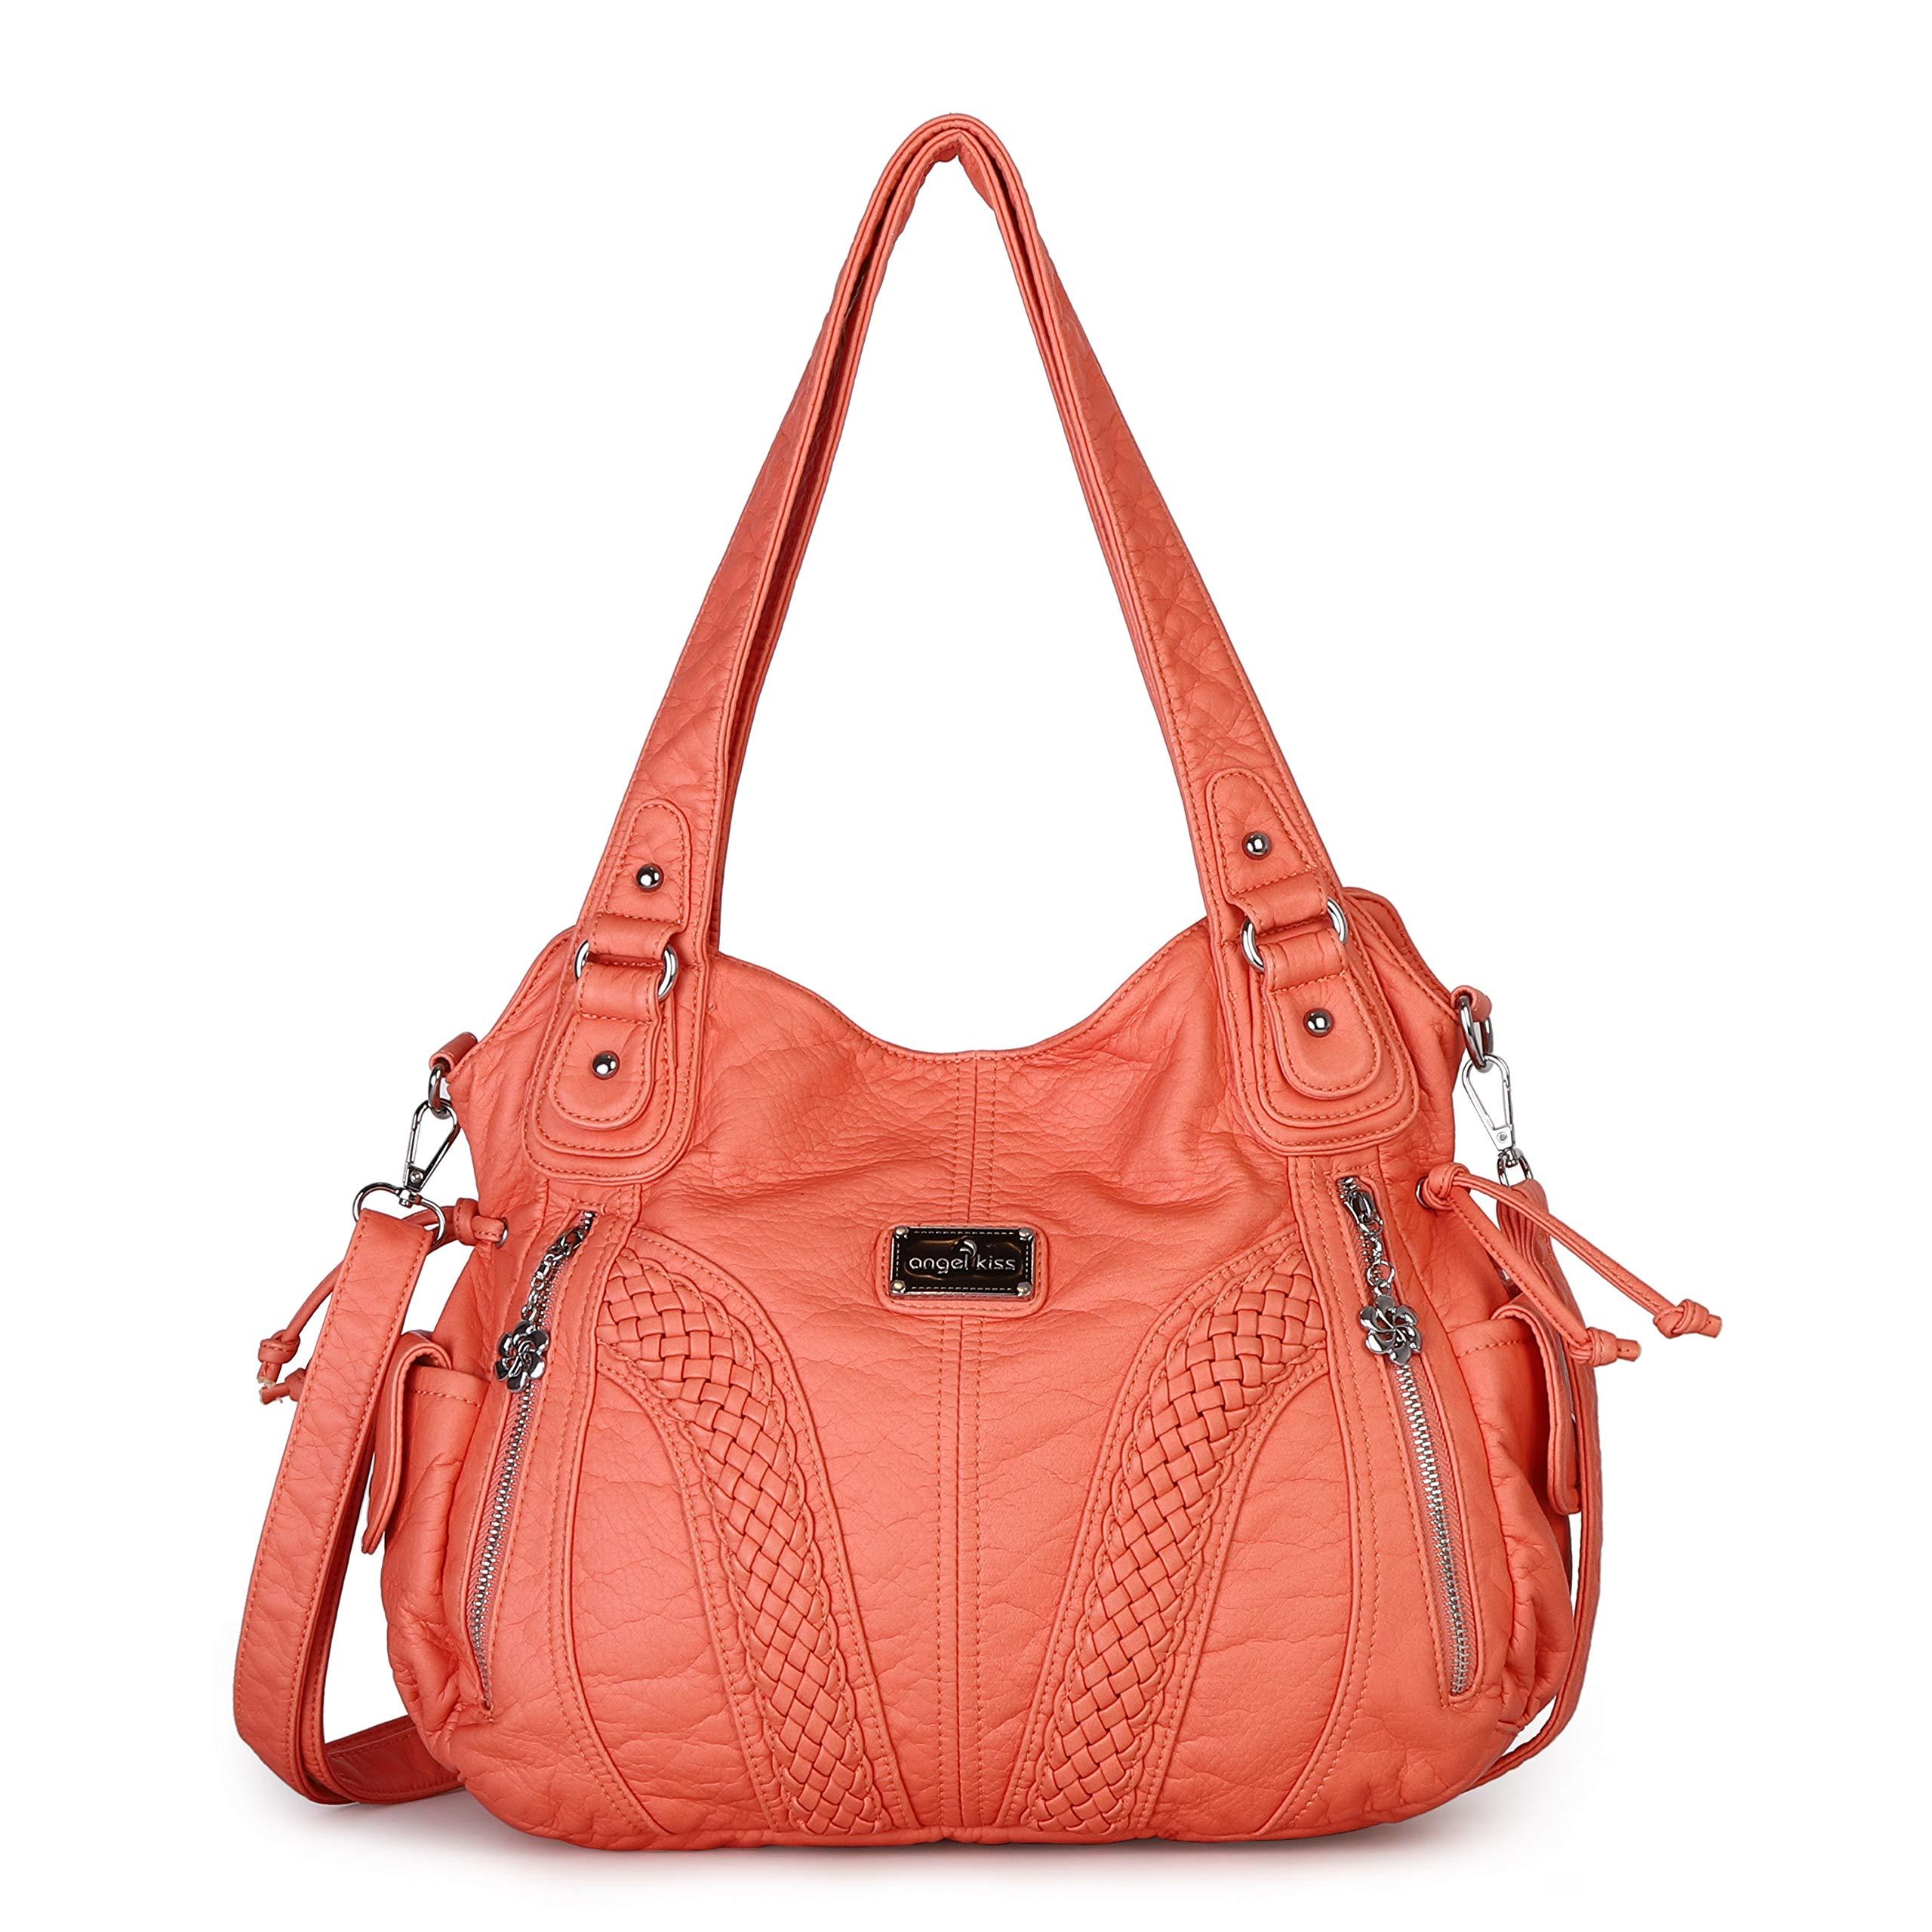 Angelkiss Women Top Handle Satchel Handbags Shoulder Bag Messenger Tote Washed Leather Purses Bag (D.Grey) …